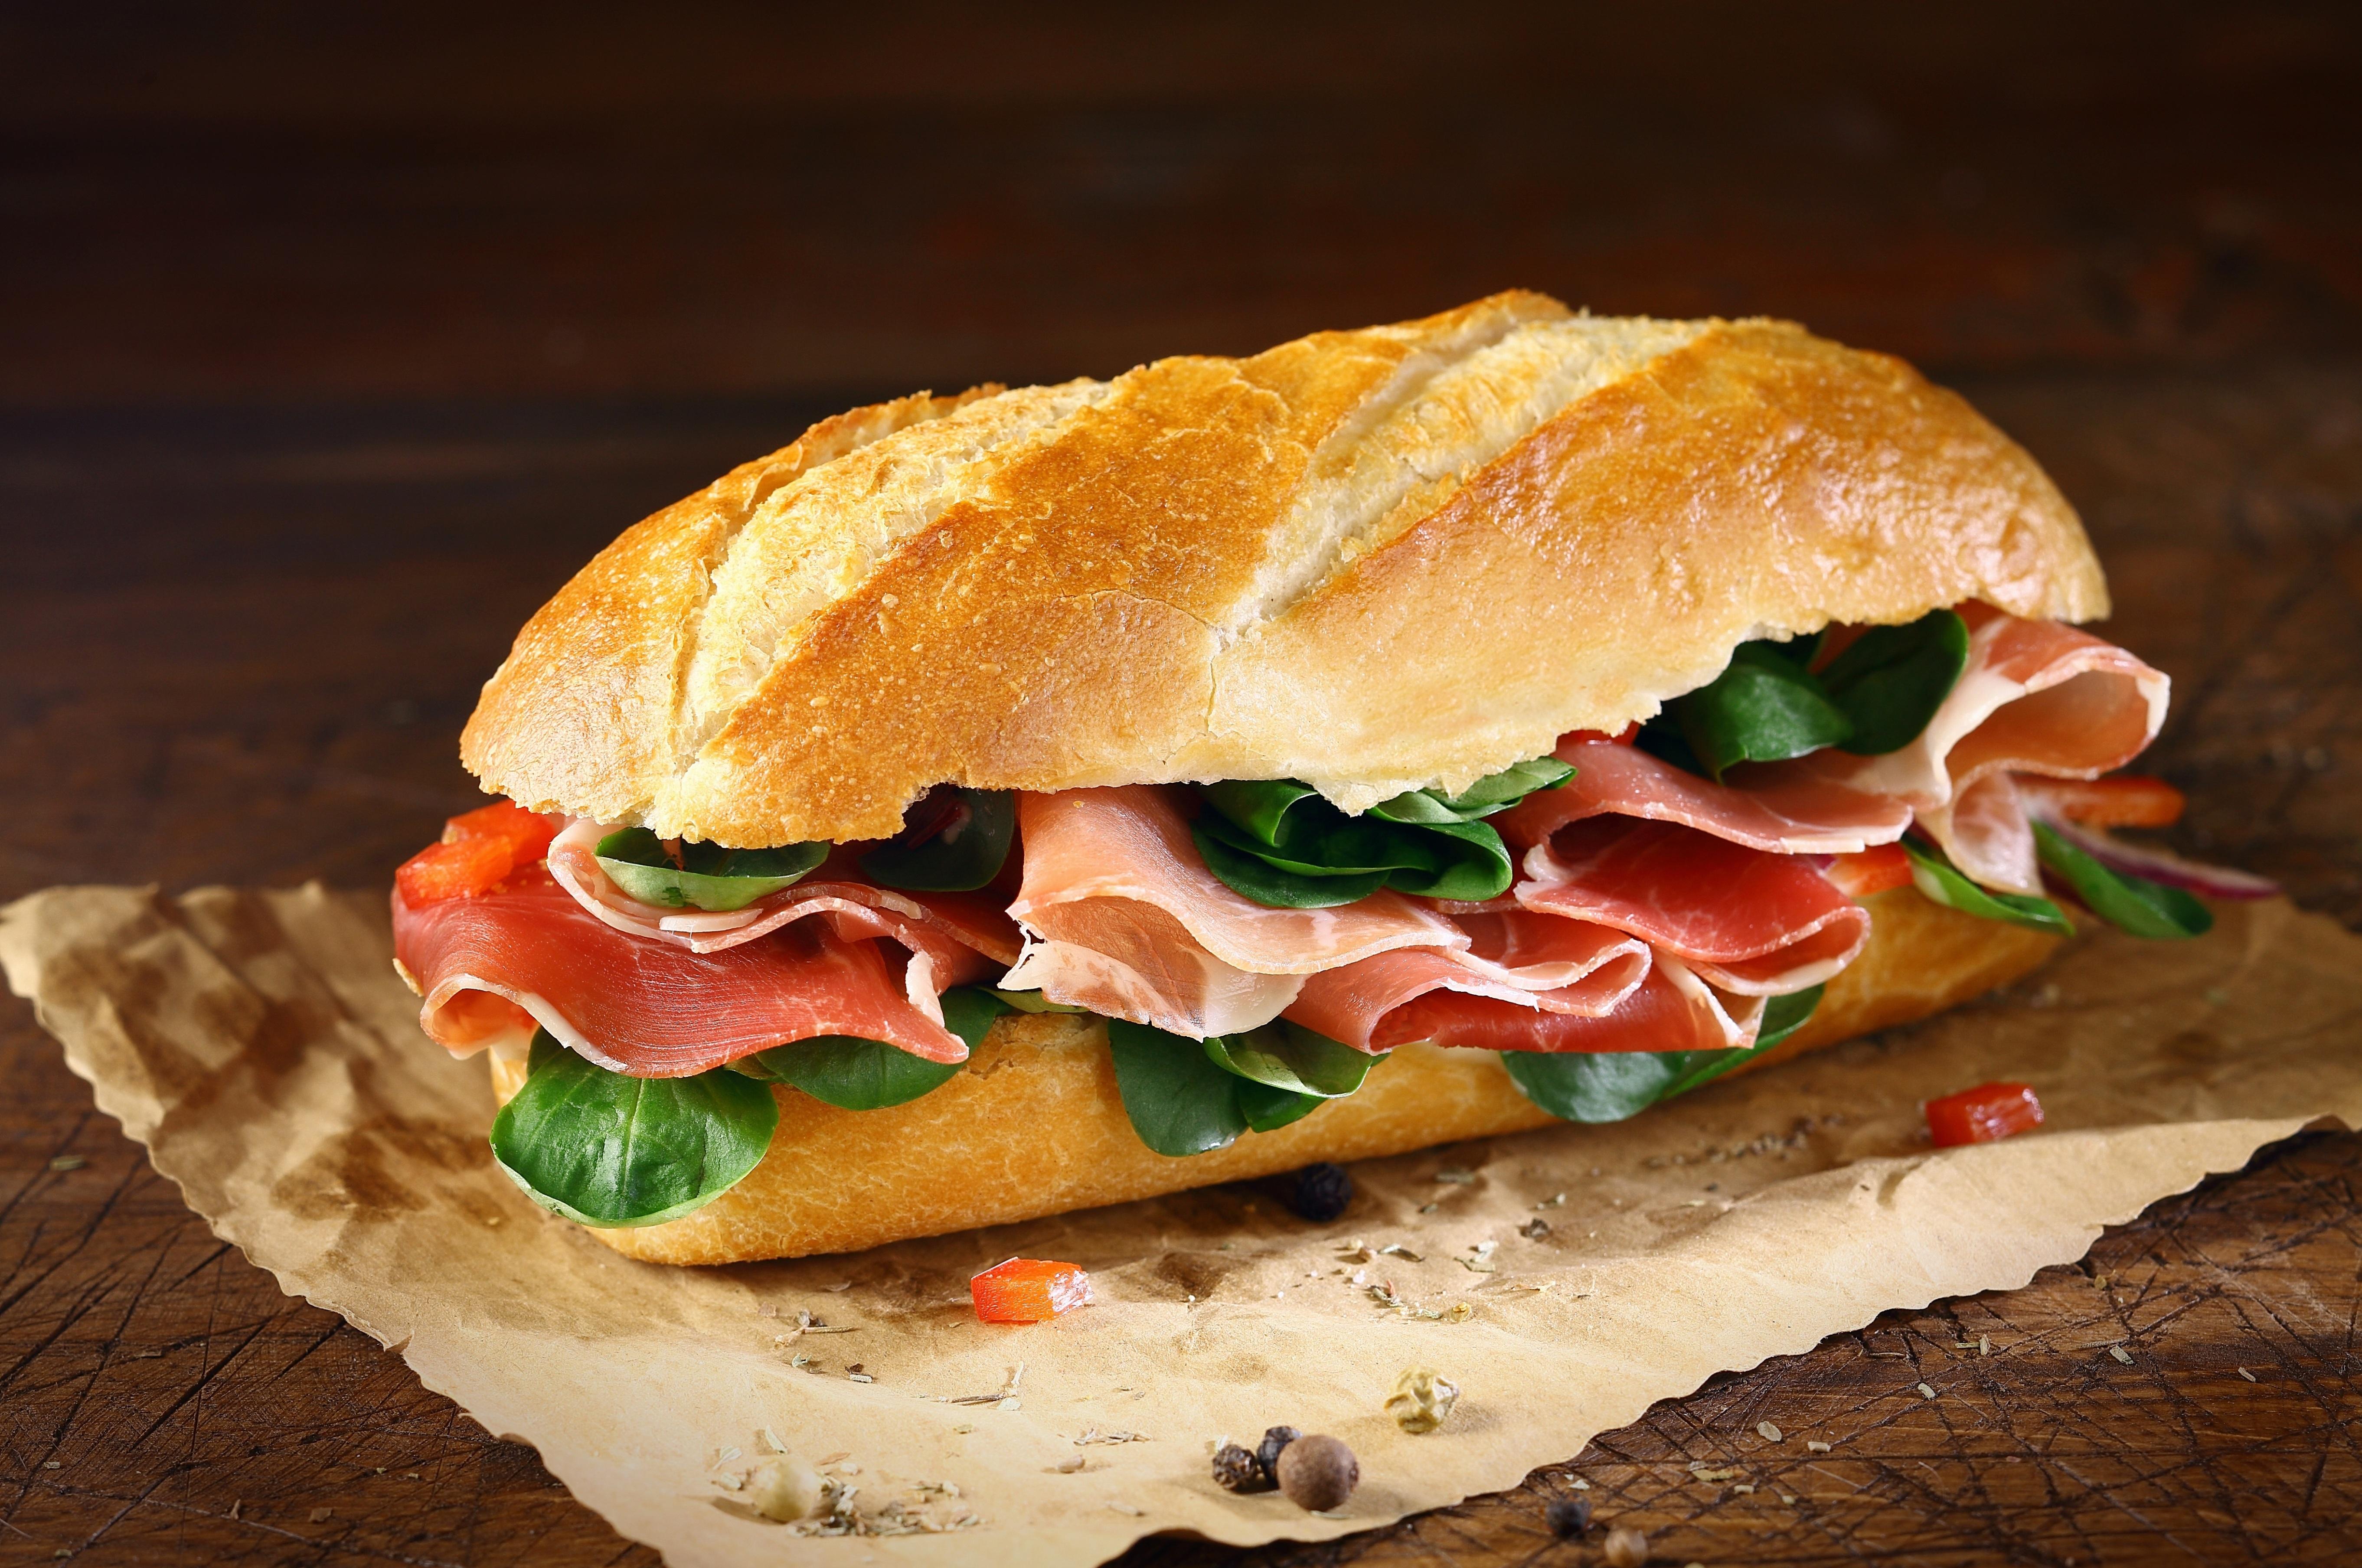 бутерброд sandwich скачать